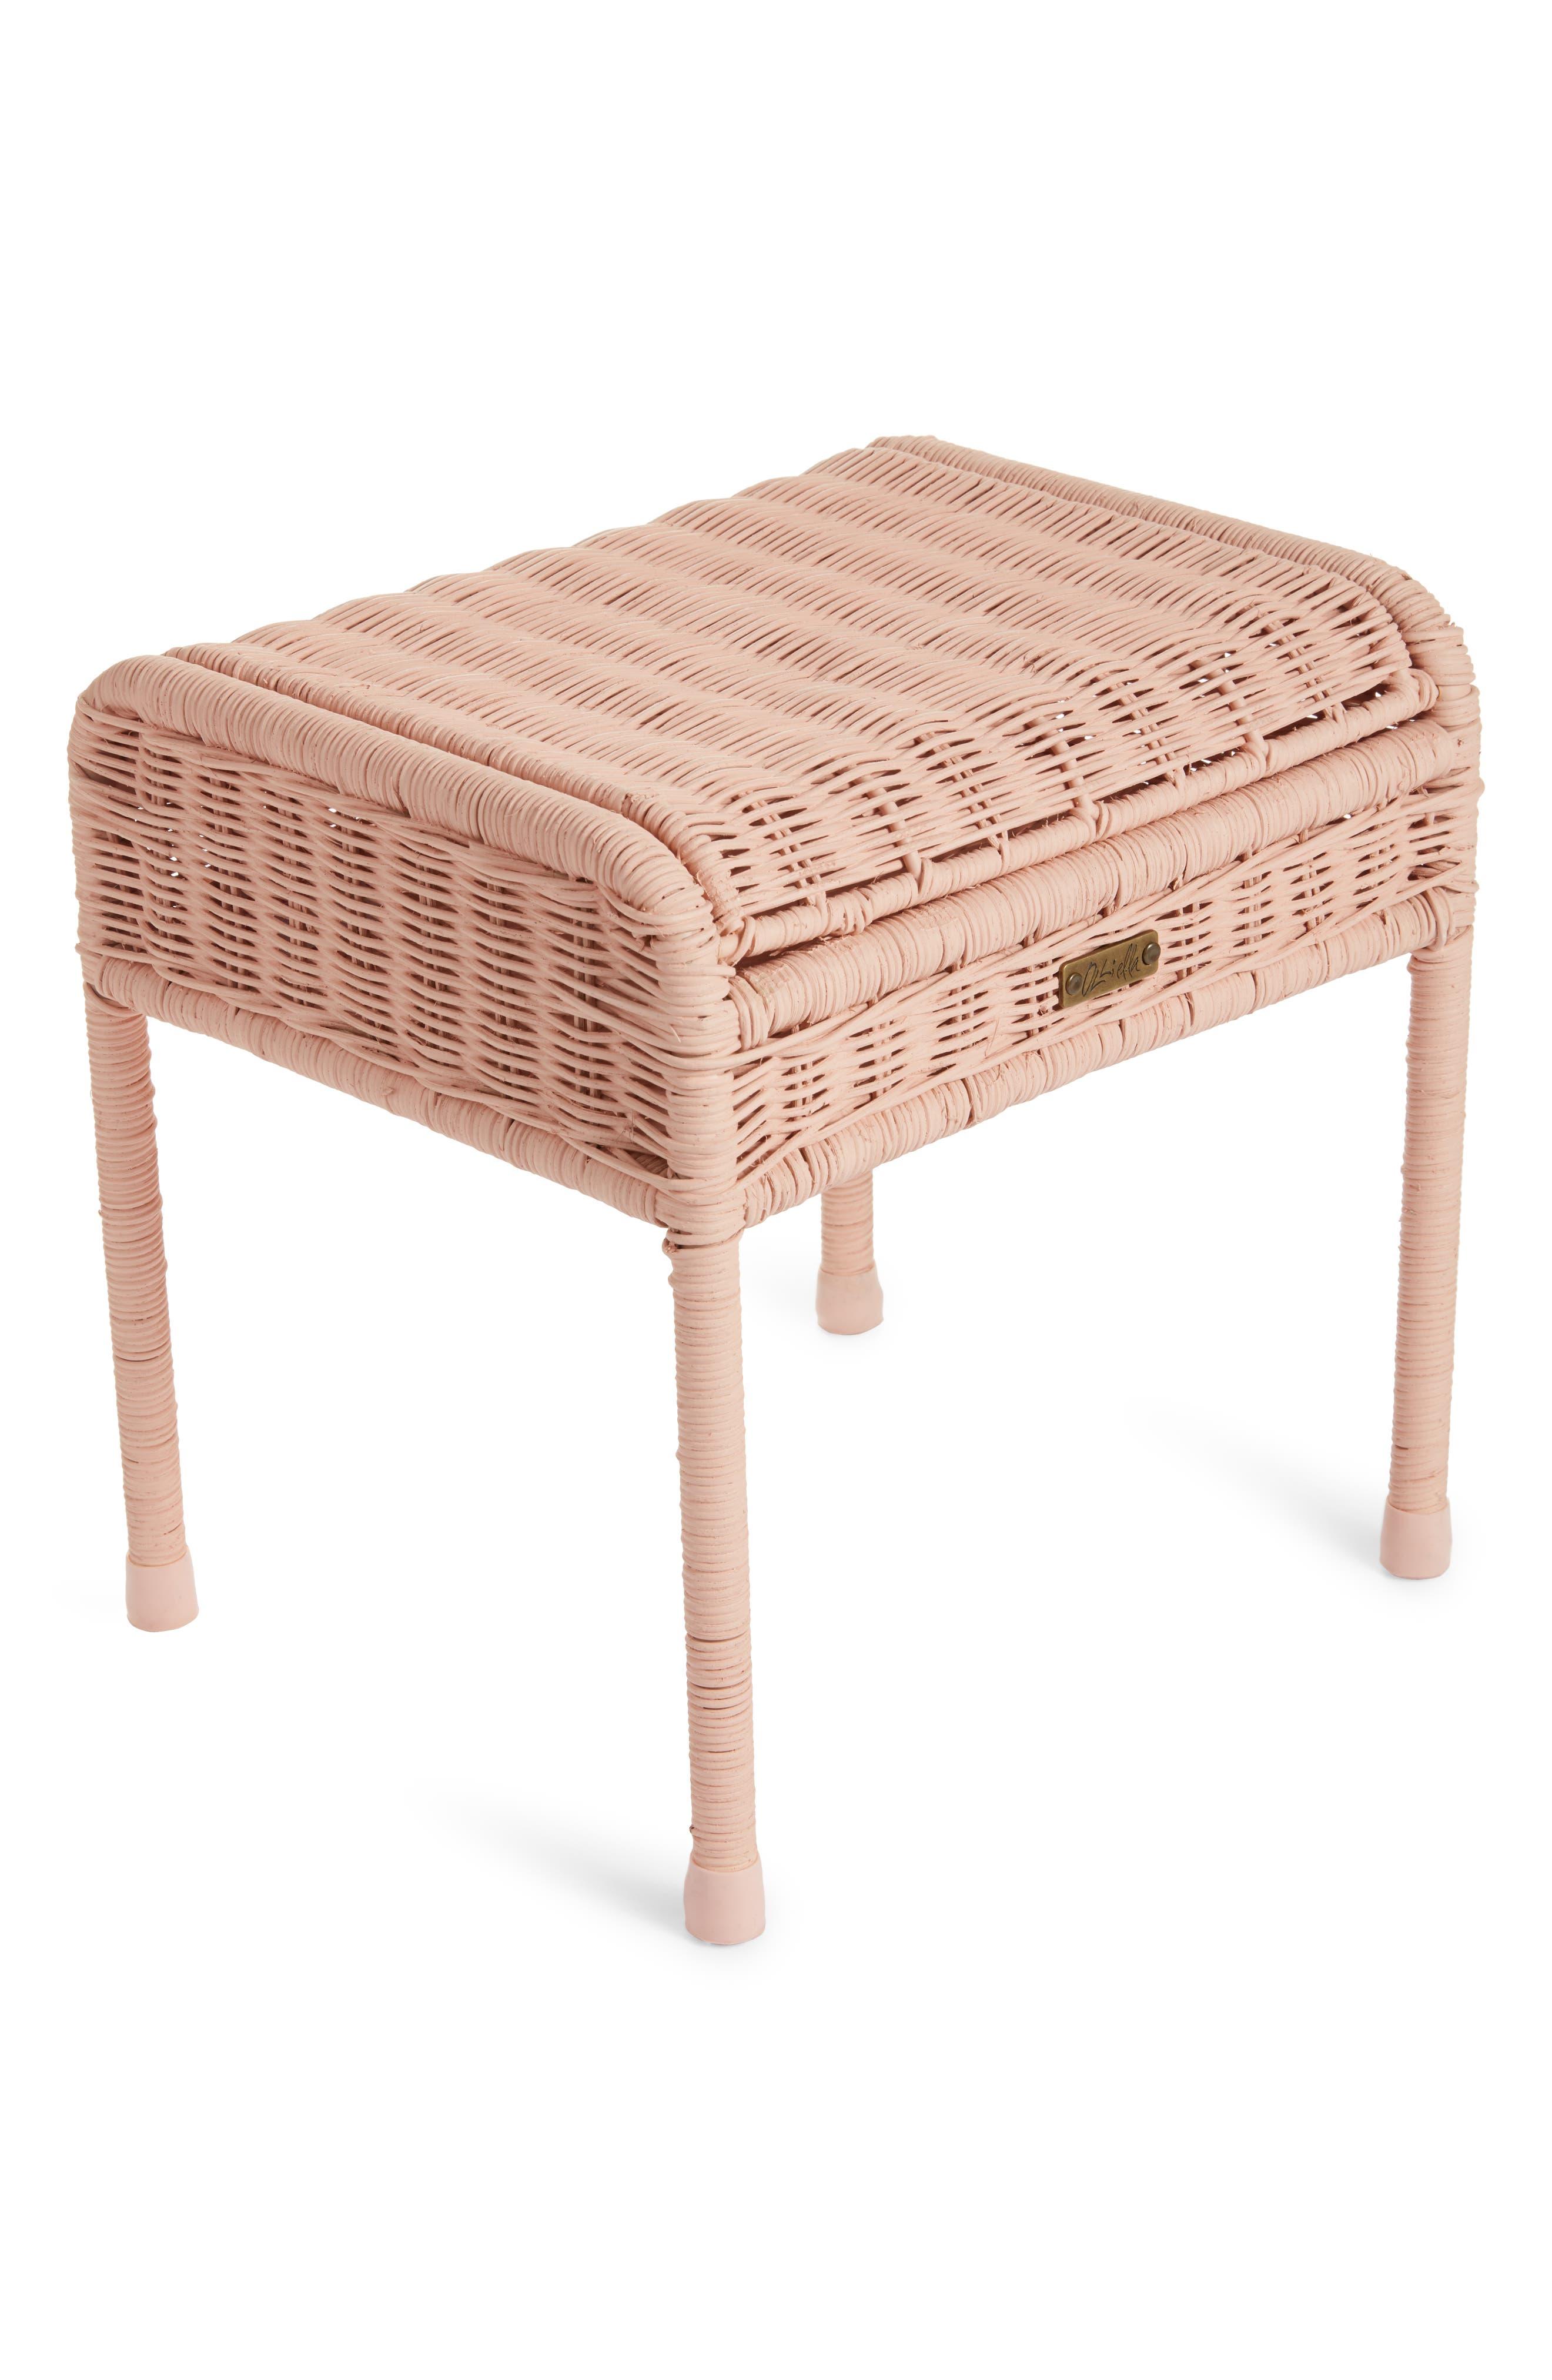 Olli Ella Storie Stool Rattan Storage Seat Size One Size  Pink